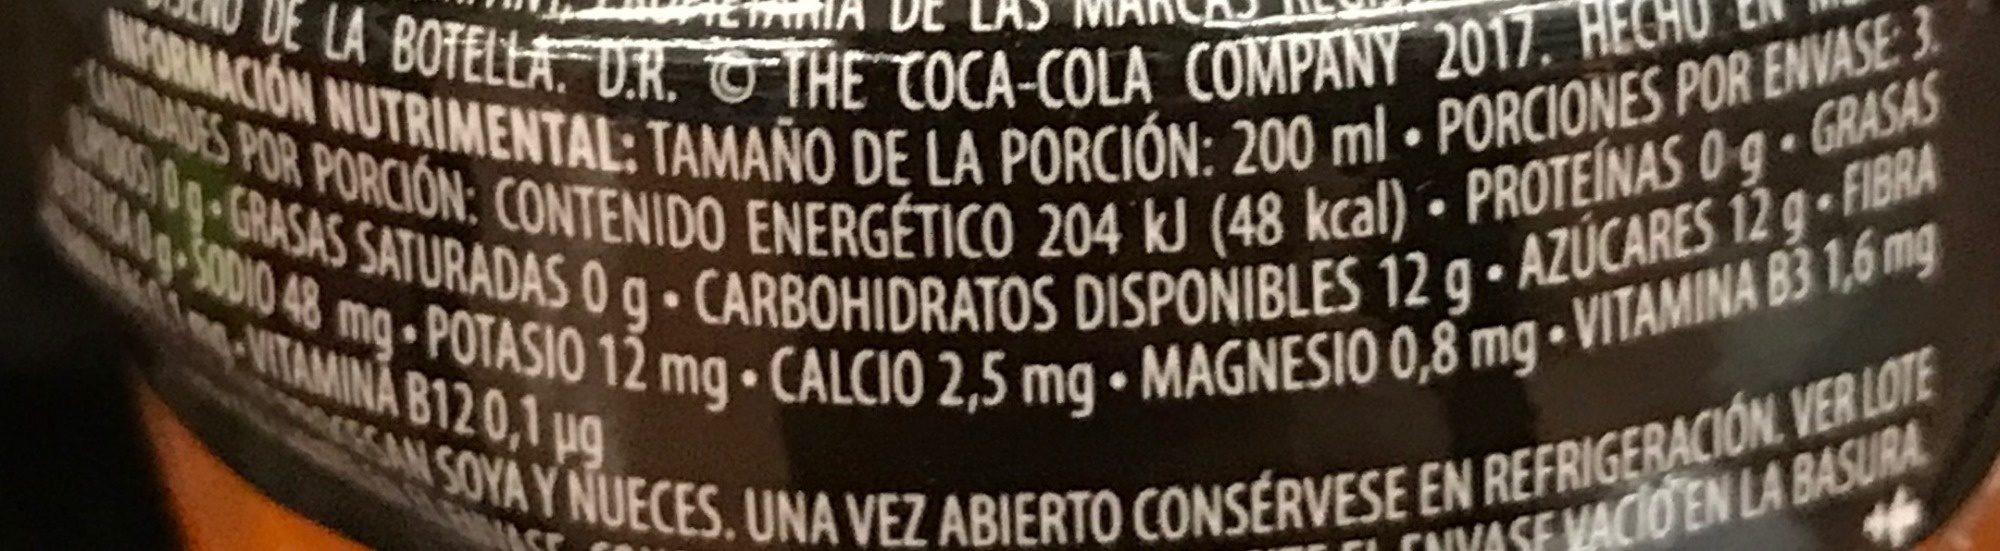 Powerade Ion 4 Naranja - Nutrition facts - es